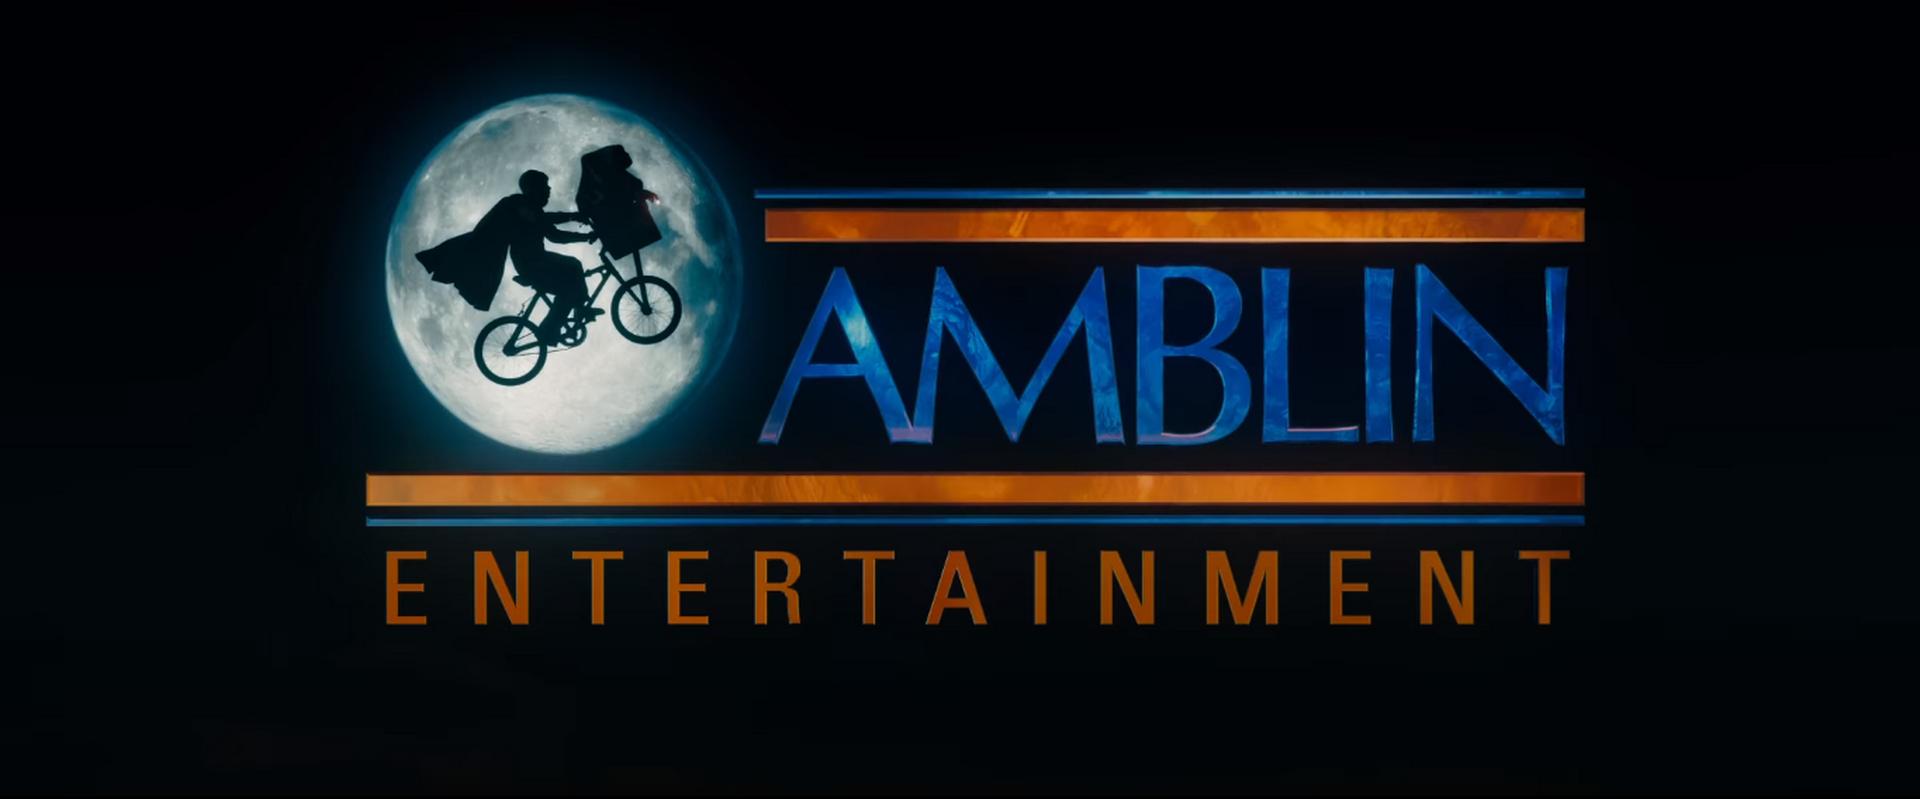 amblin entertainment disney wiki fandom powered by wikia tristar television logo history tristar television logo 2015